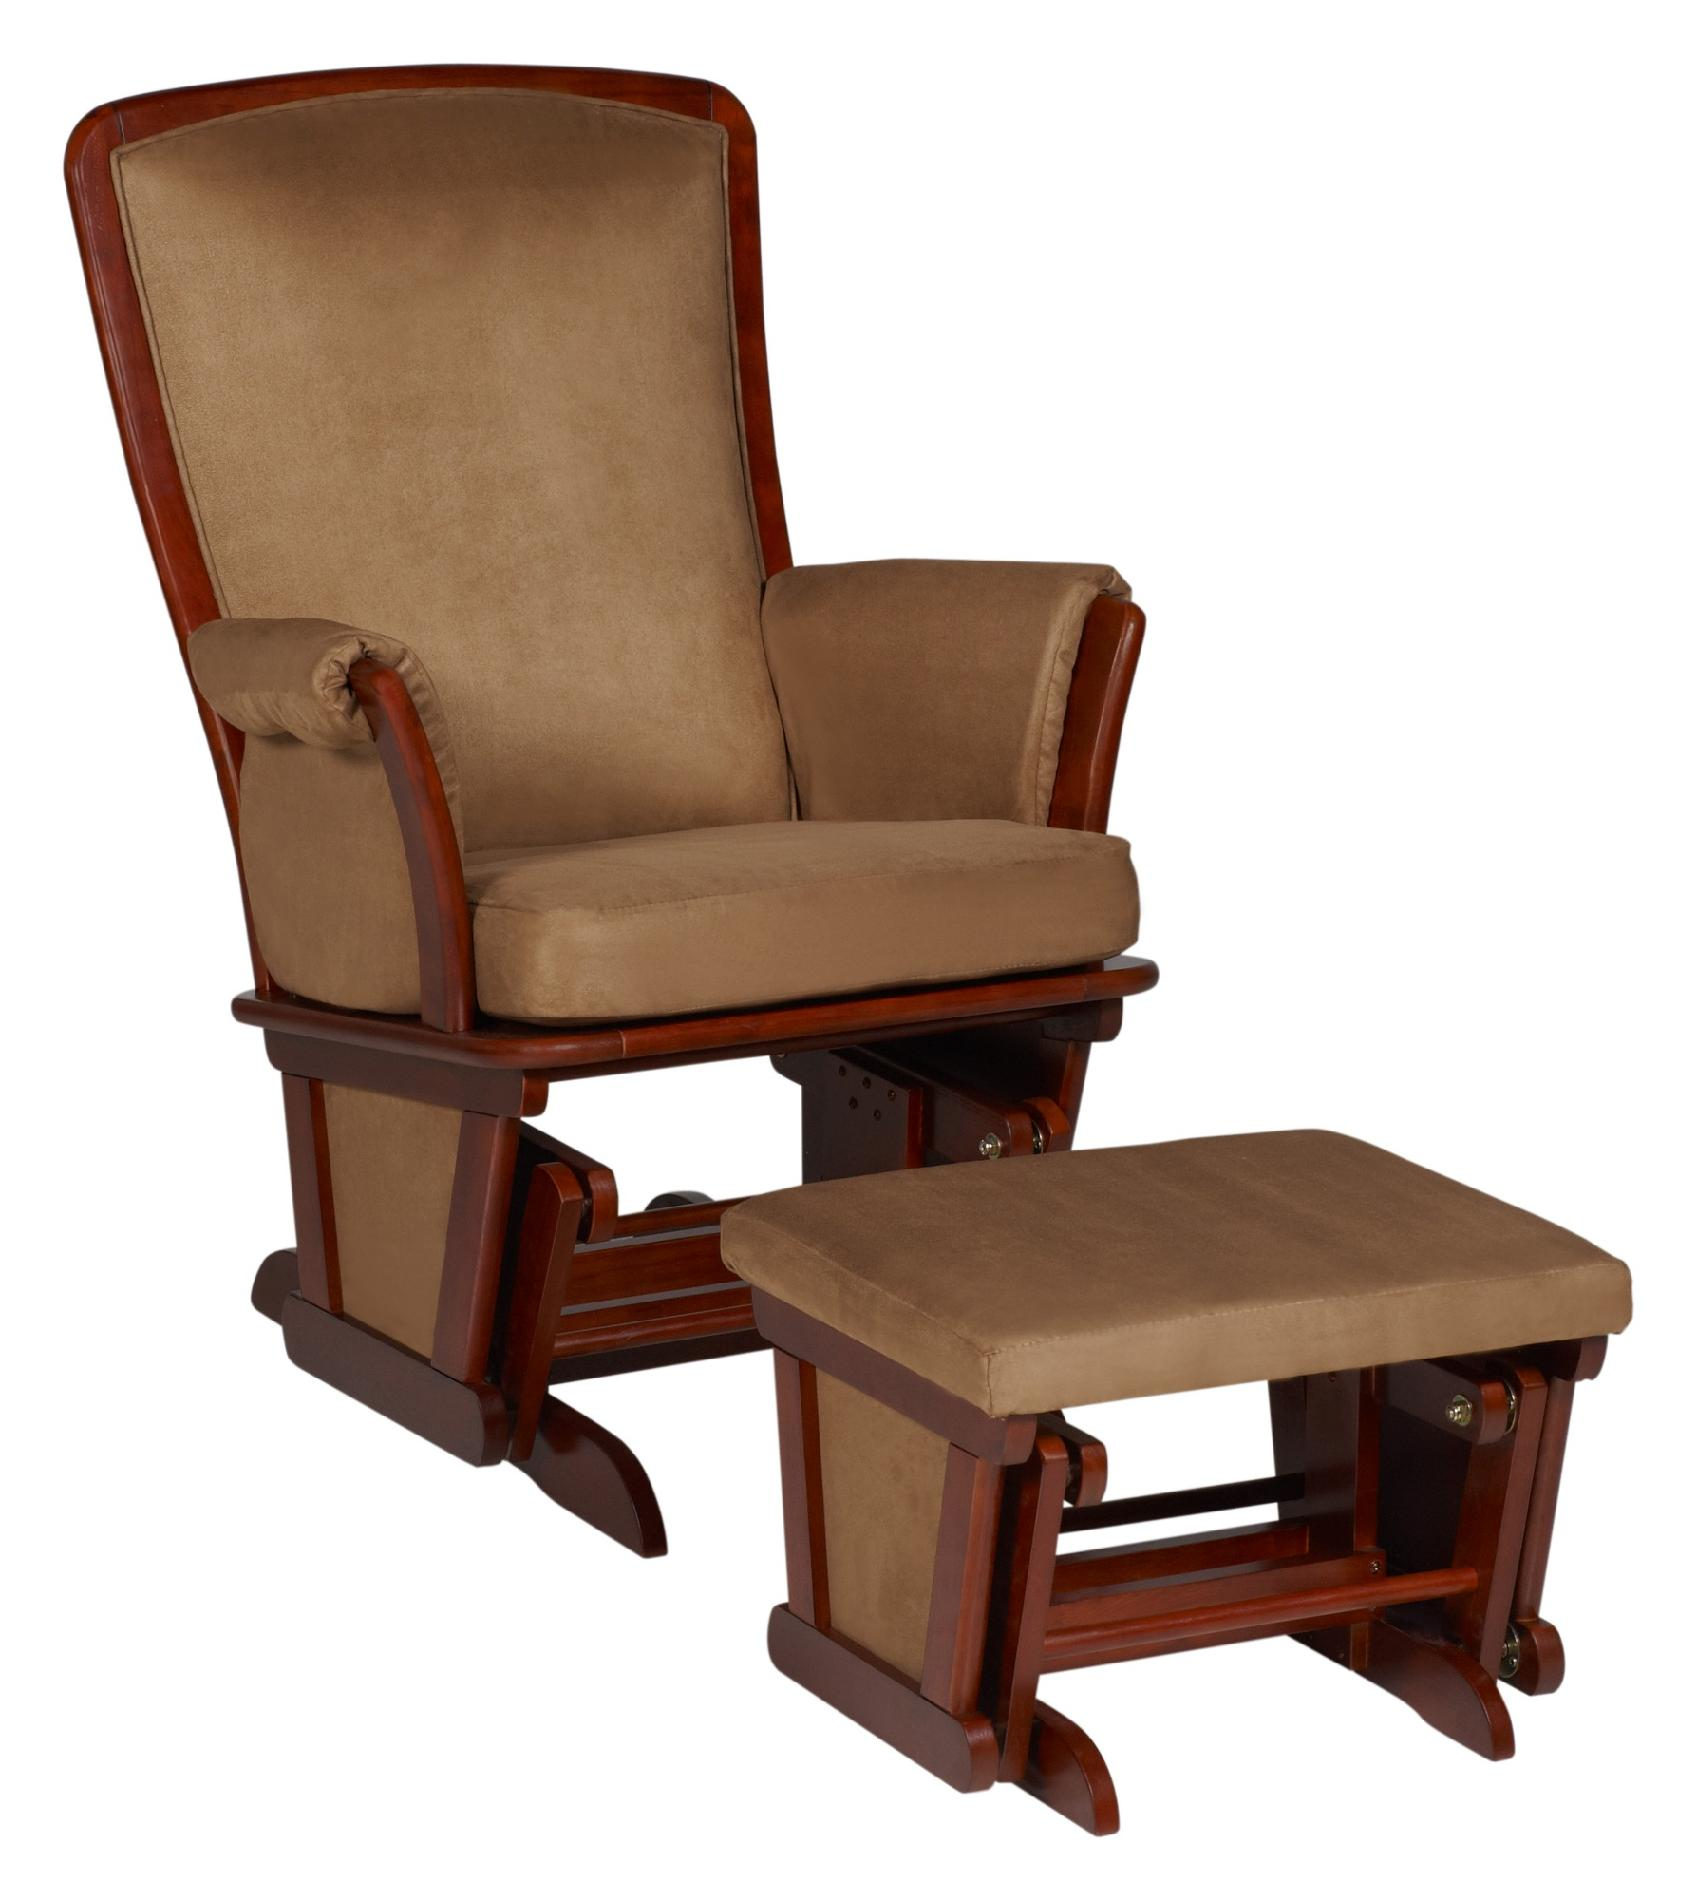 kids upholstered rocking chair gym workout delta children glider and ottoman vintage